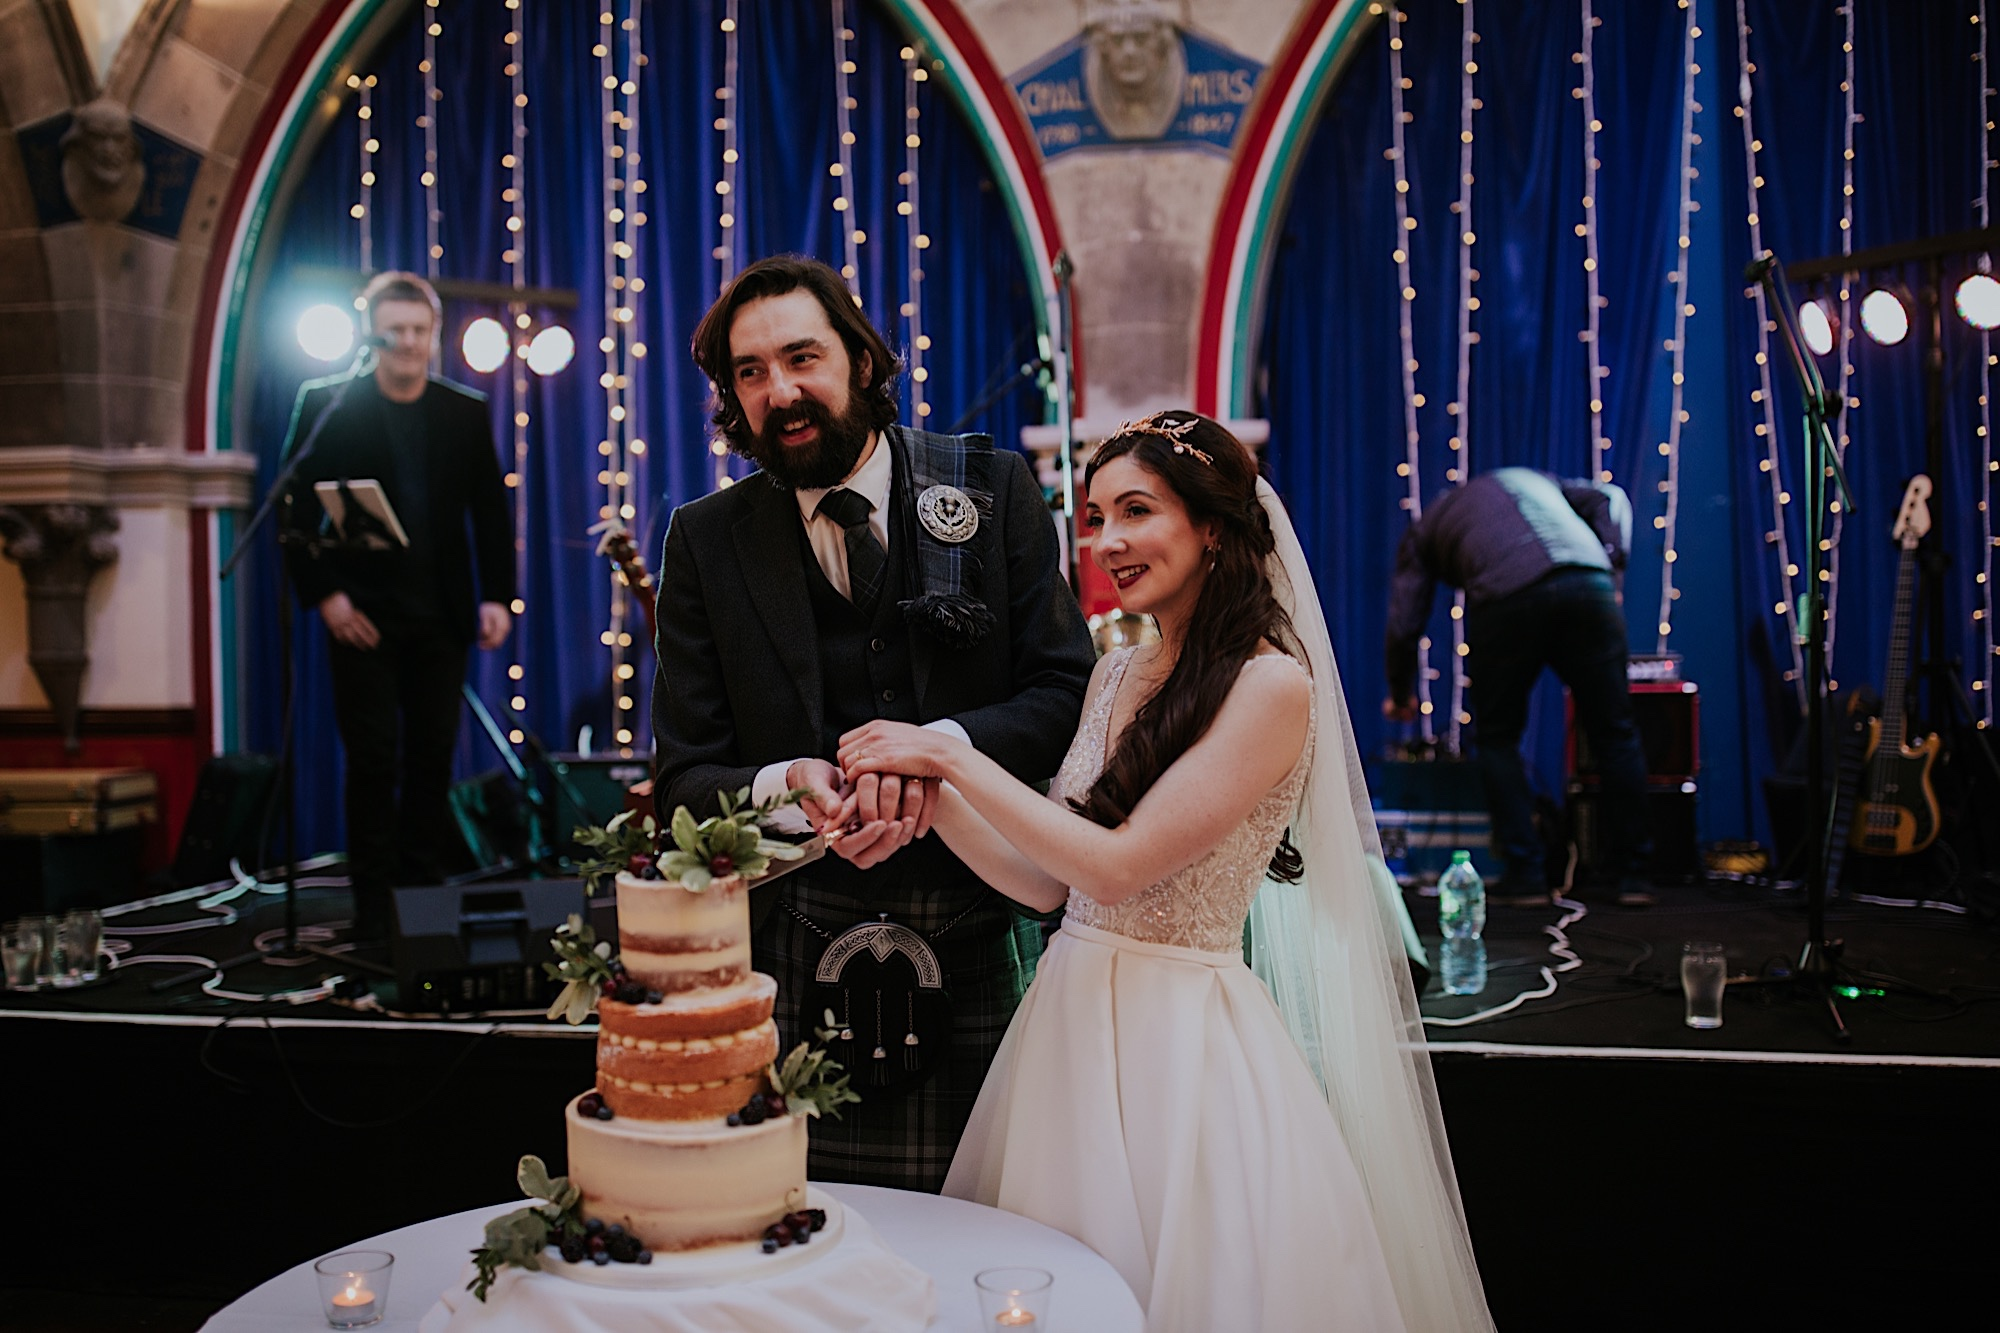 bride and groom naked wedding cake at oran mor glasgow wedding